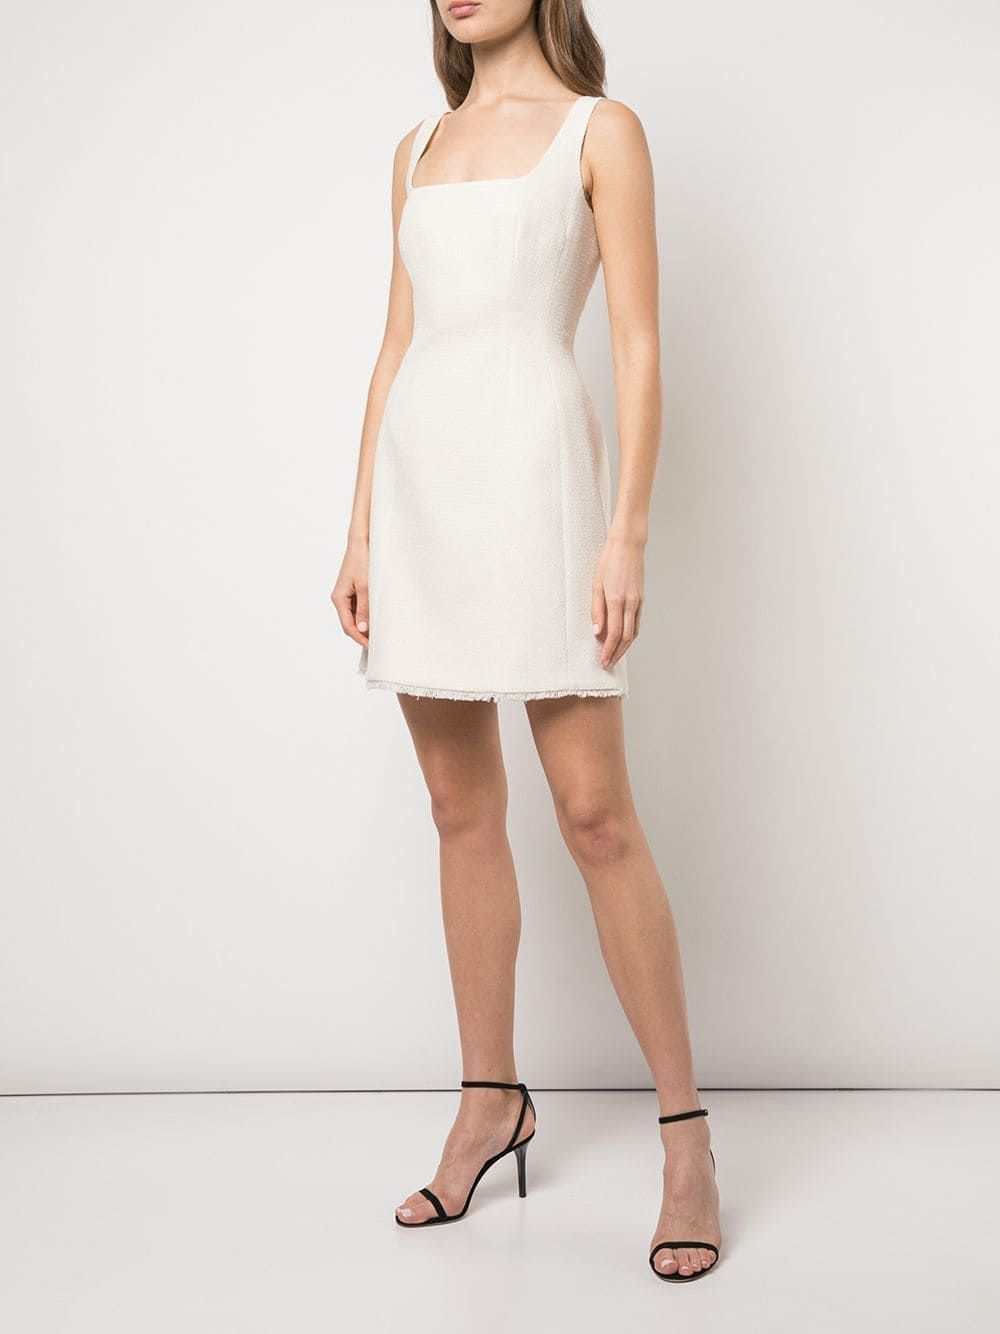 Alexa Chung Square Neck Short Dress Farfetch Dresses Short Dresses Square Neck Dress